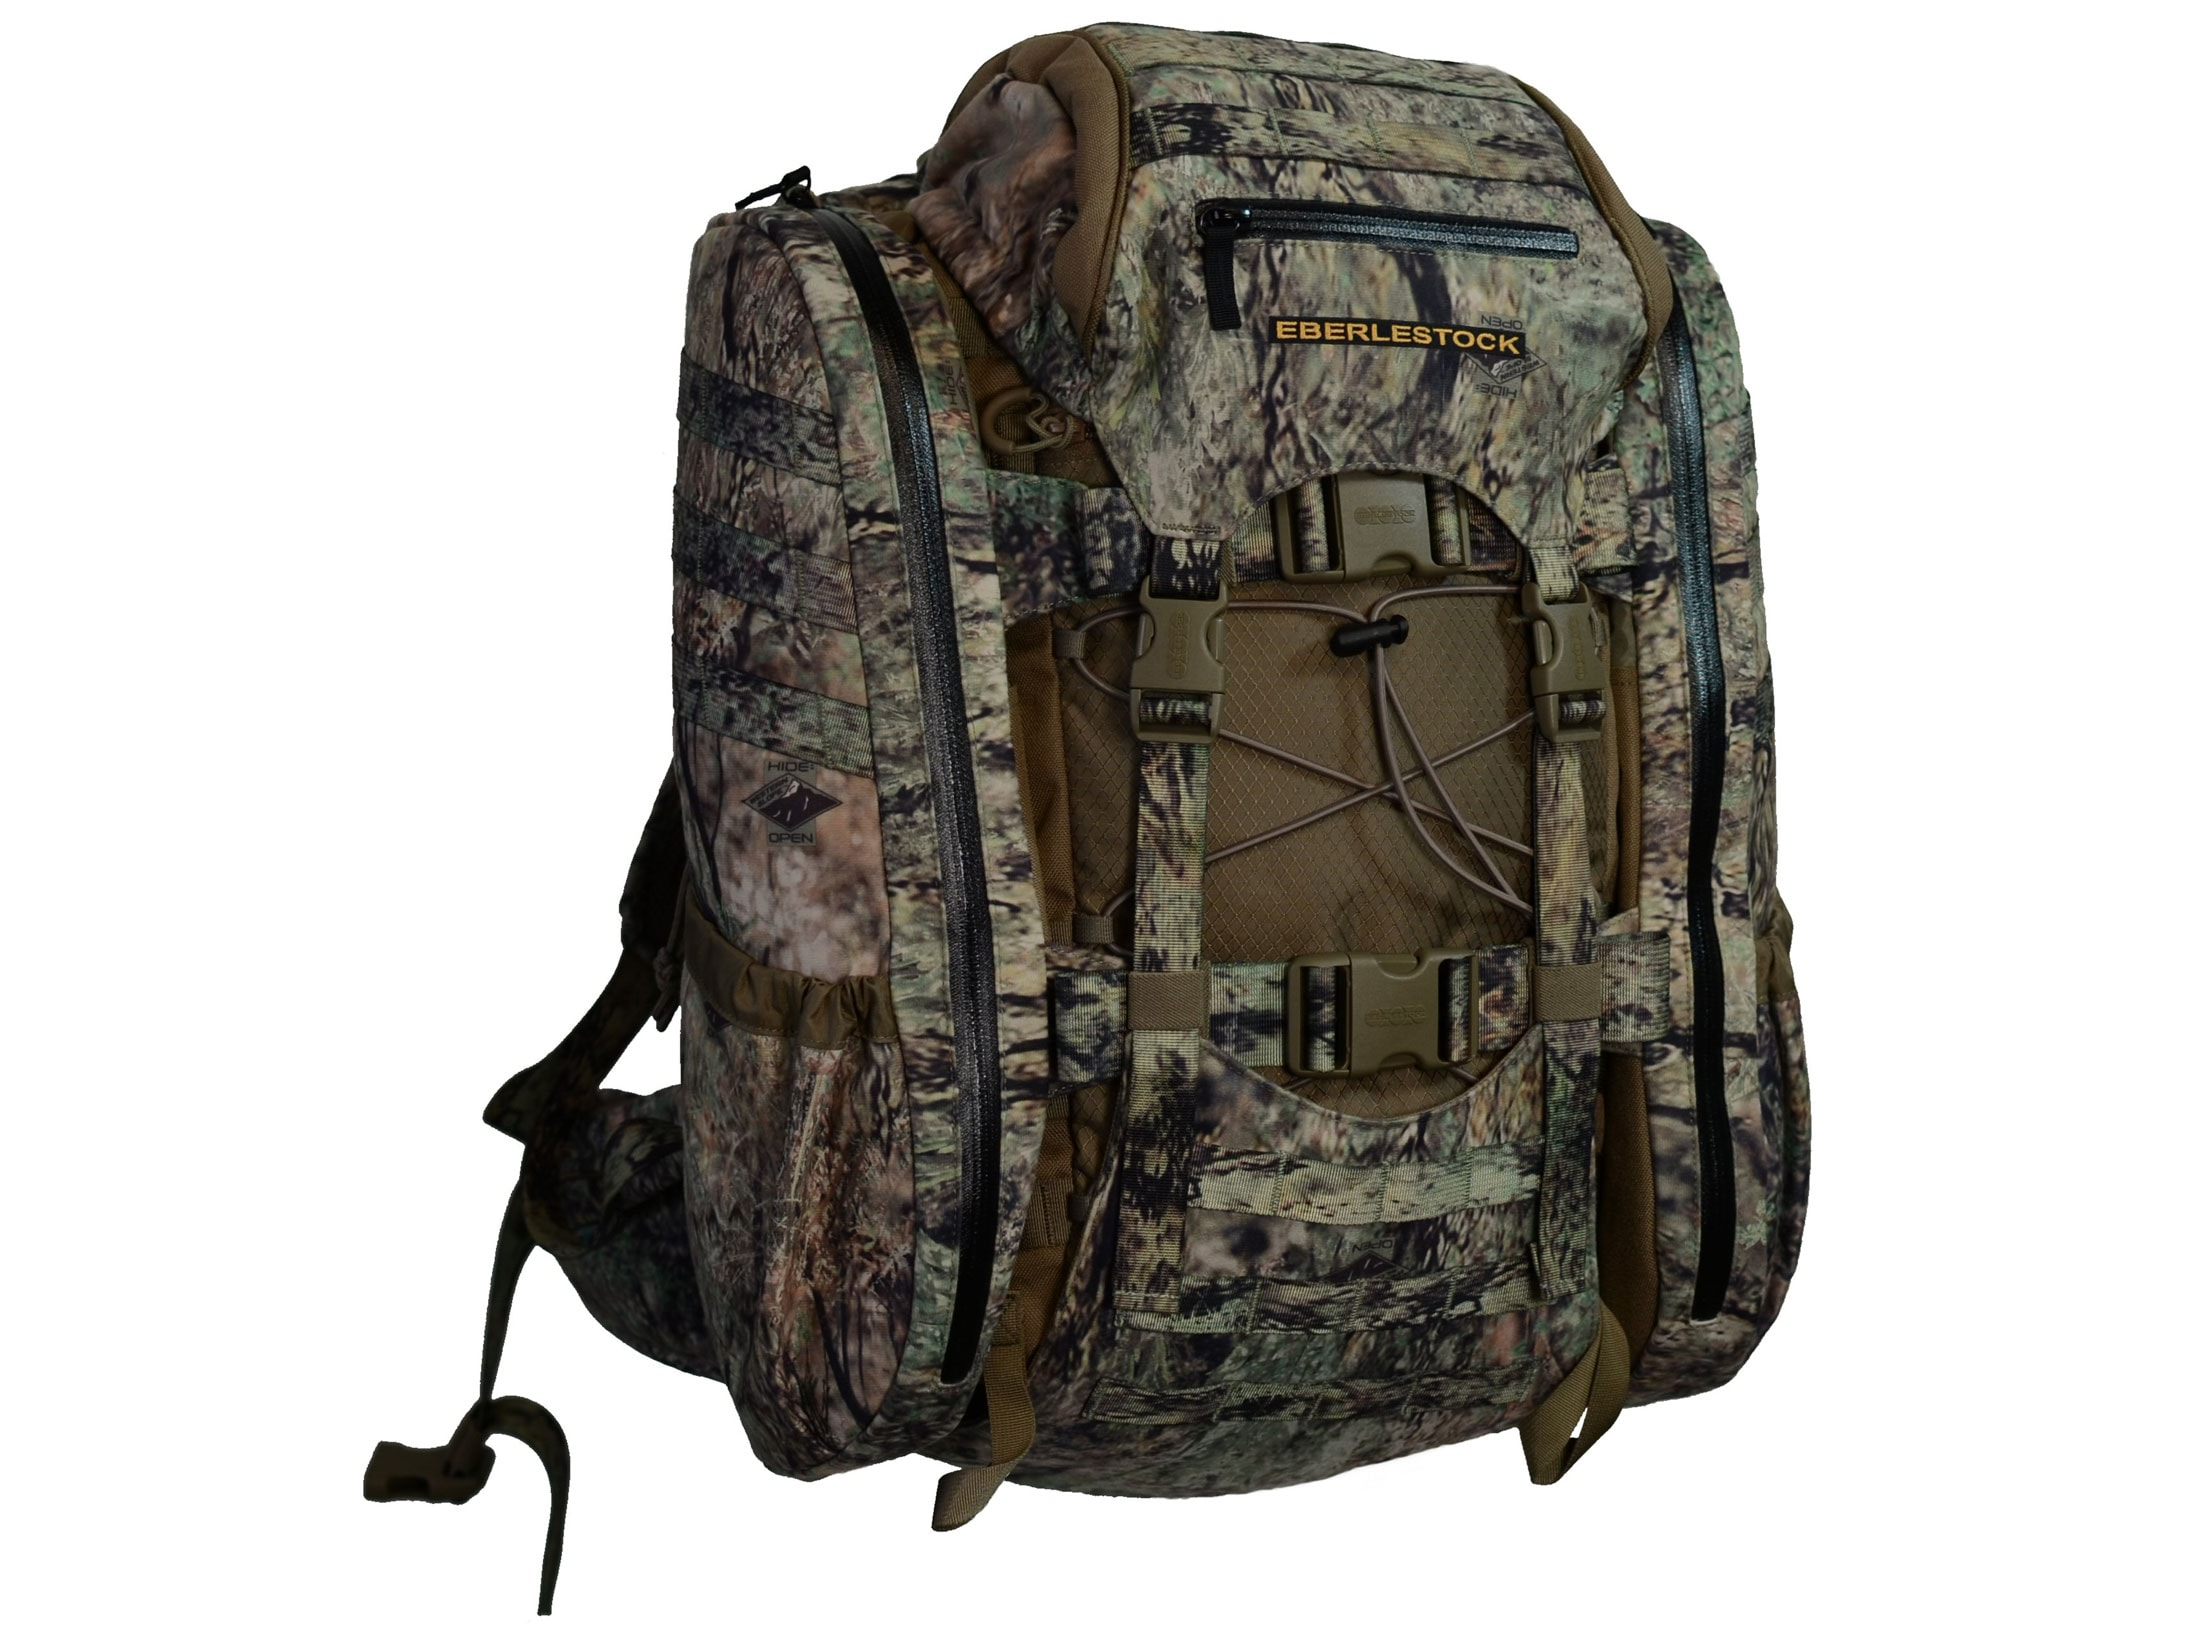 Eberlestock X2 Backpack NT-7 Hide-Open Western